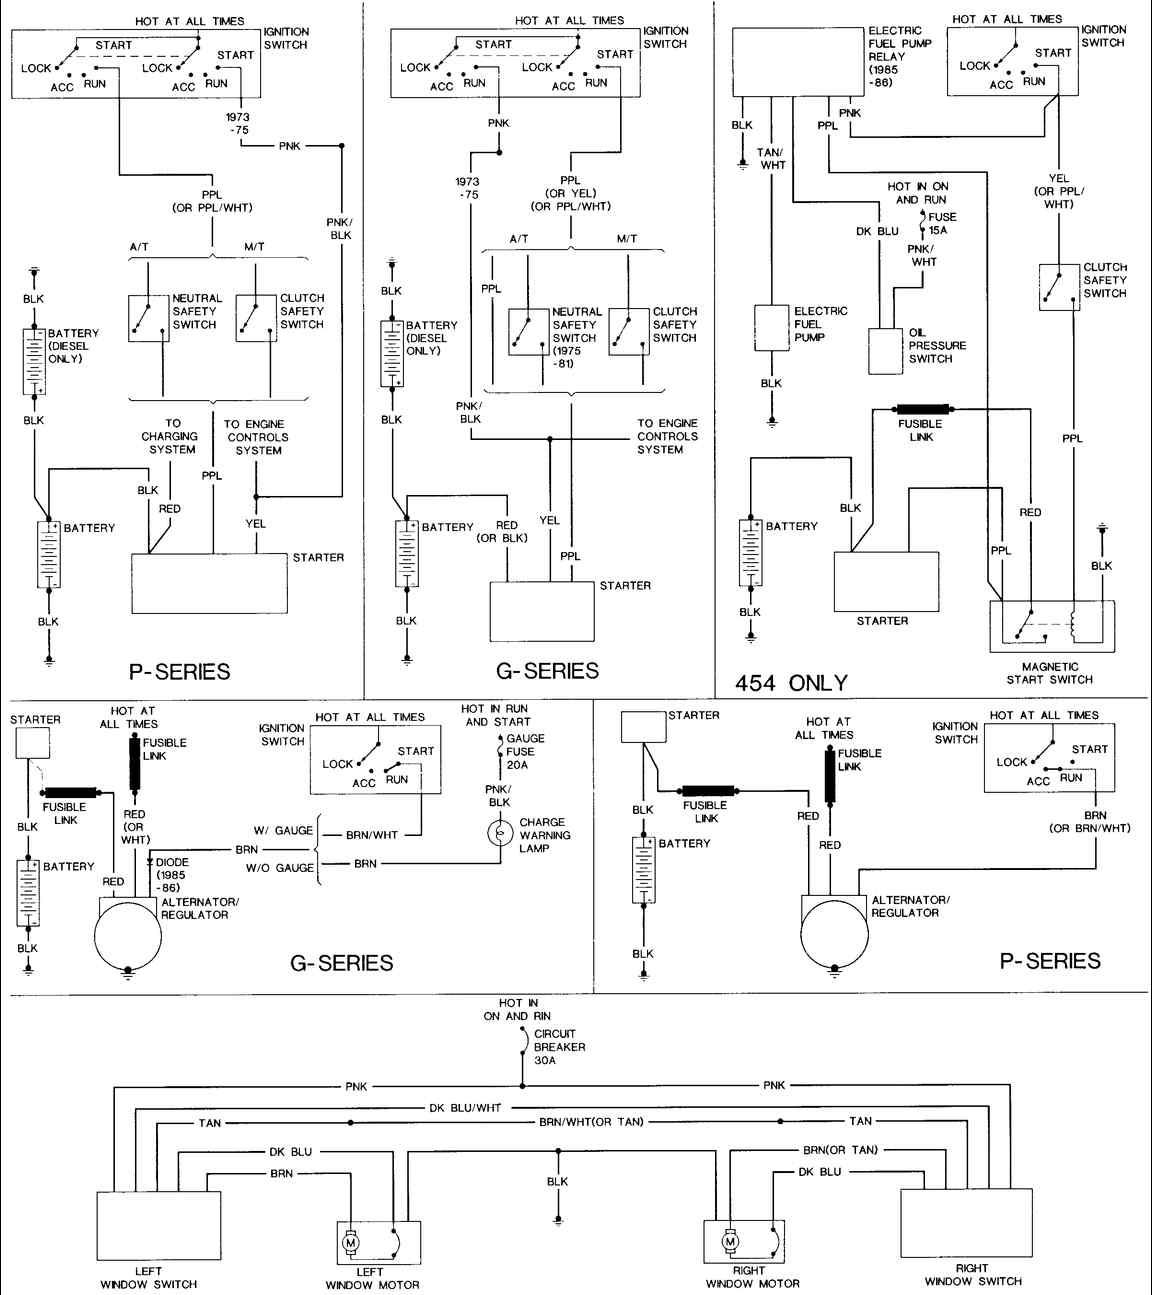 85 Camaro Wiring Diagram Wiring Diagram Multimedia Multimedia Wallabyviaggi It